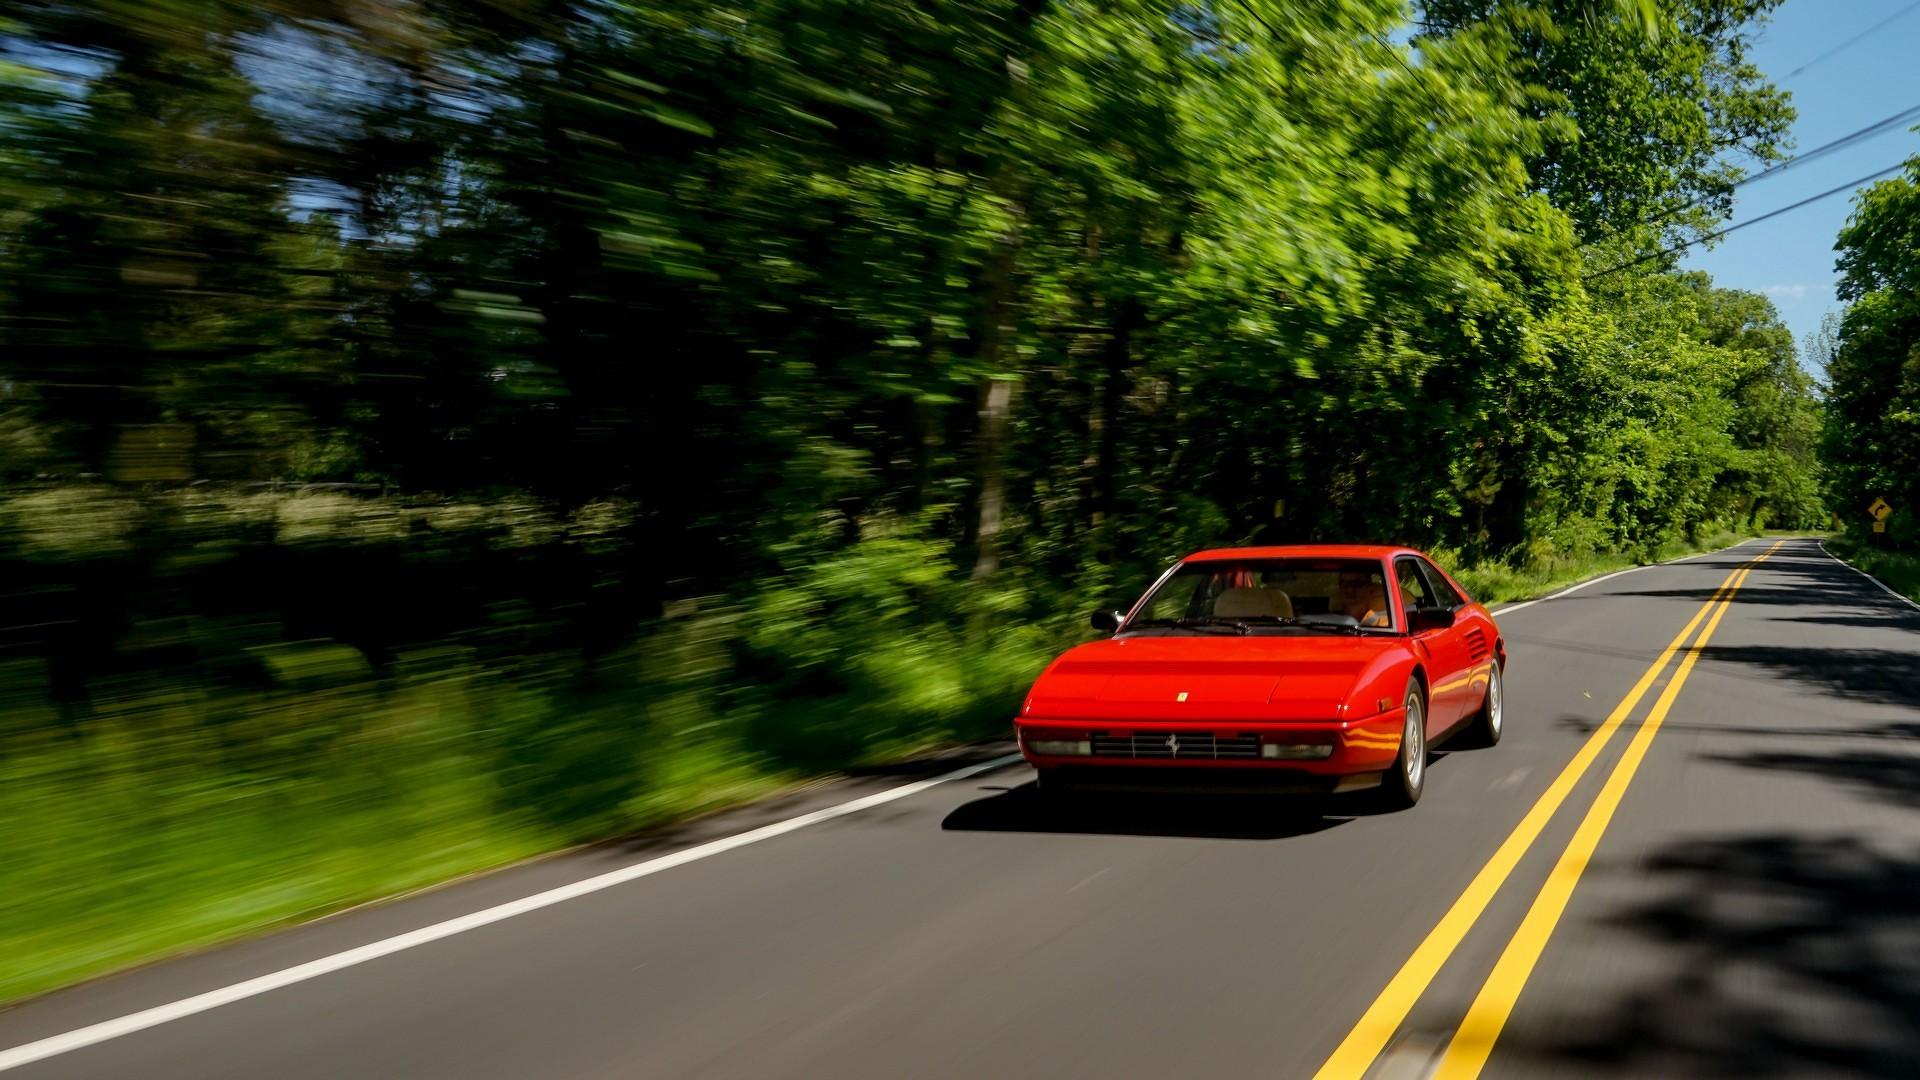 1989-ferrari-mondial-t Extraordinary Ferrari Mondial 3.4 T Review Cars Trend